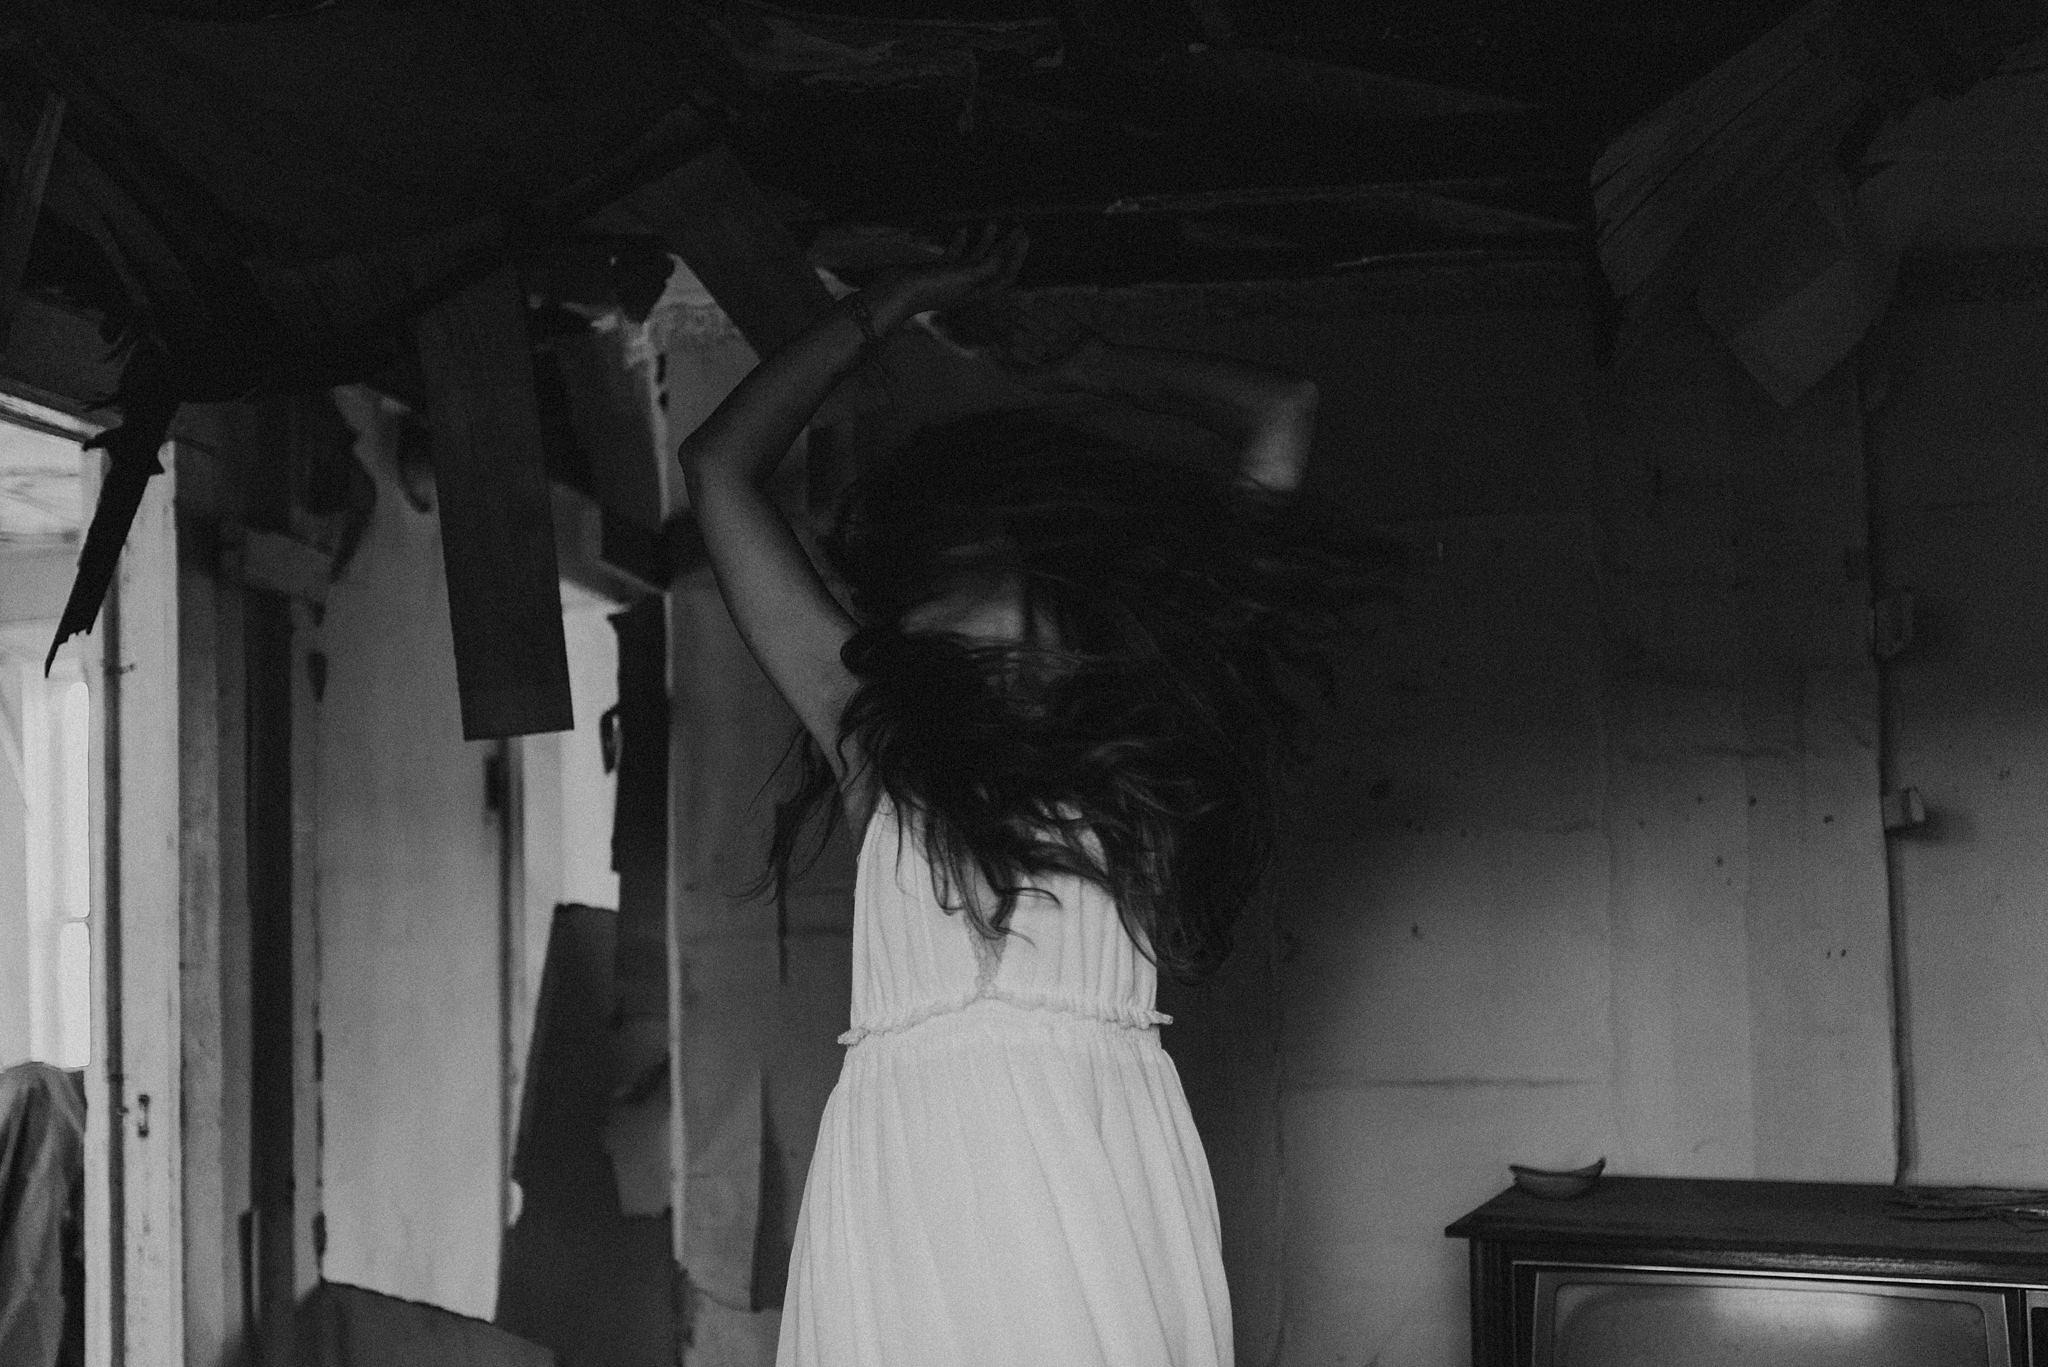 twyla jones photography - west palm beach florida photographer - boudoir in an old house-5250_treasure coast florida-1.jpg